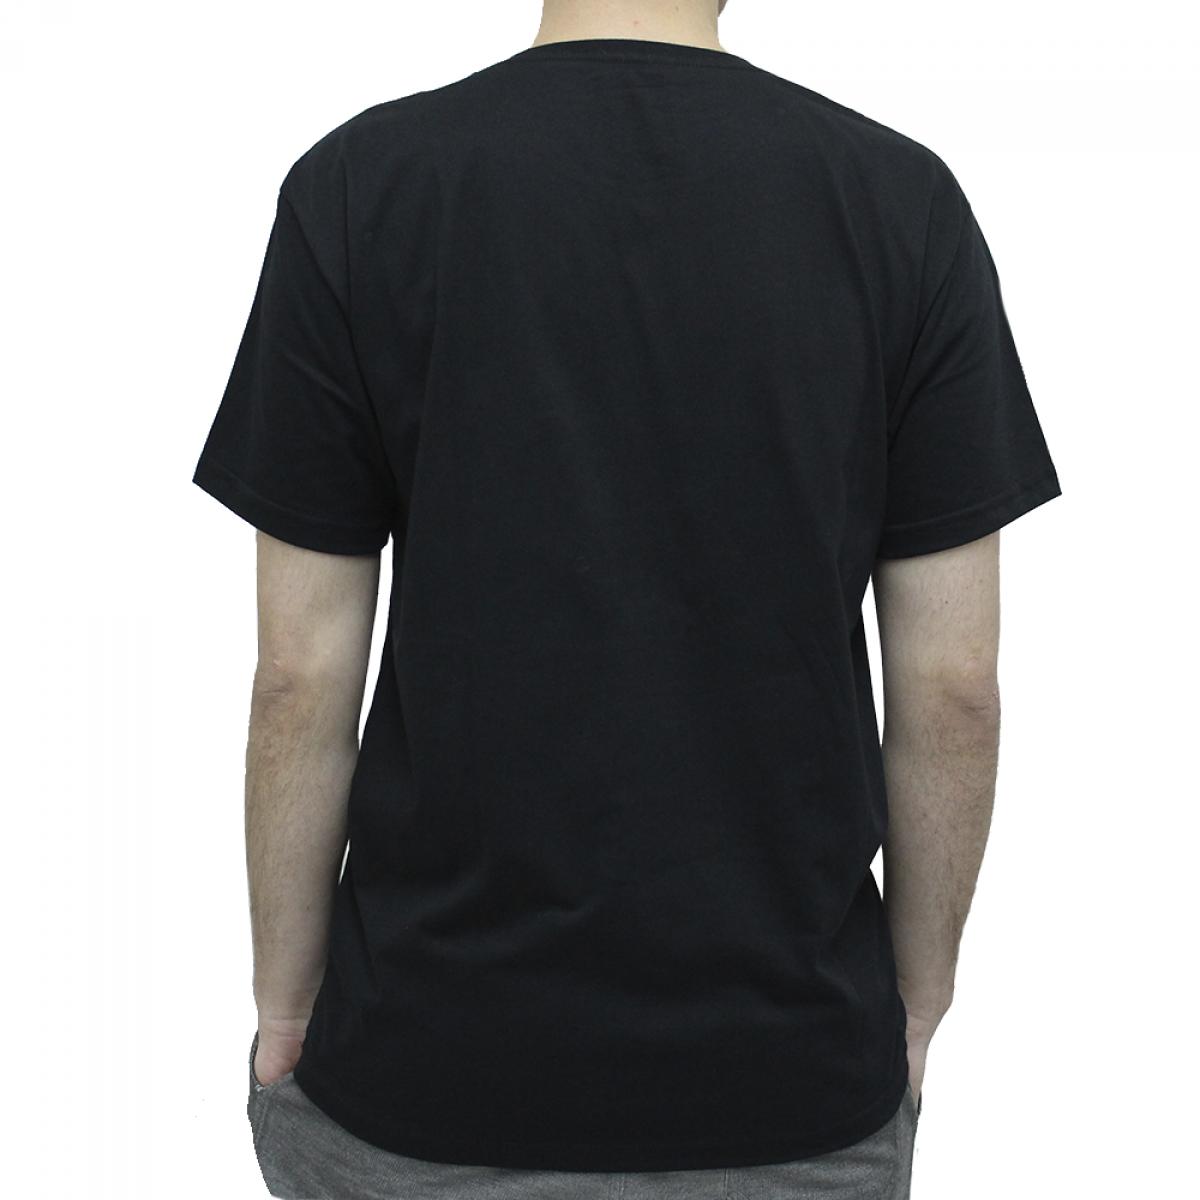 Camiseta Terabyteshop, Unisex, Manga Curta, Algodão, Preto e Laranja, Logo (M)